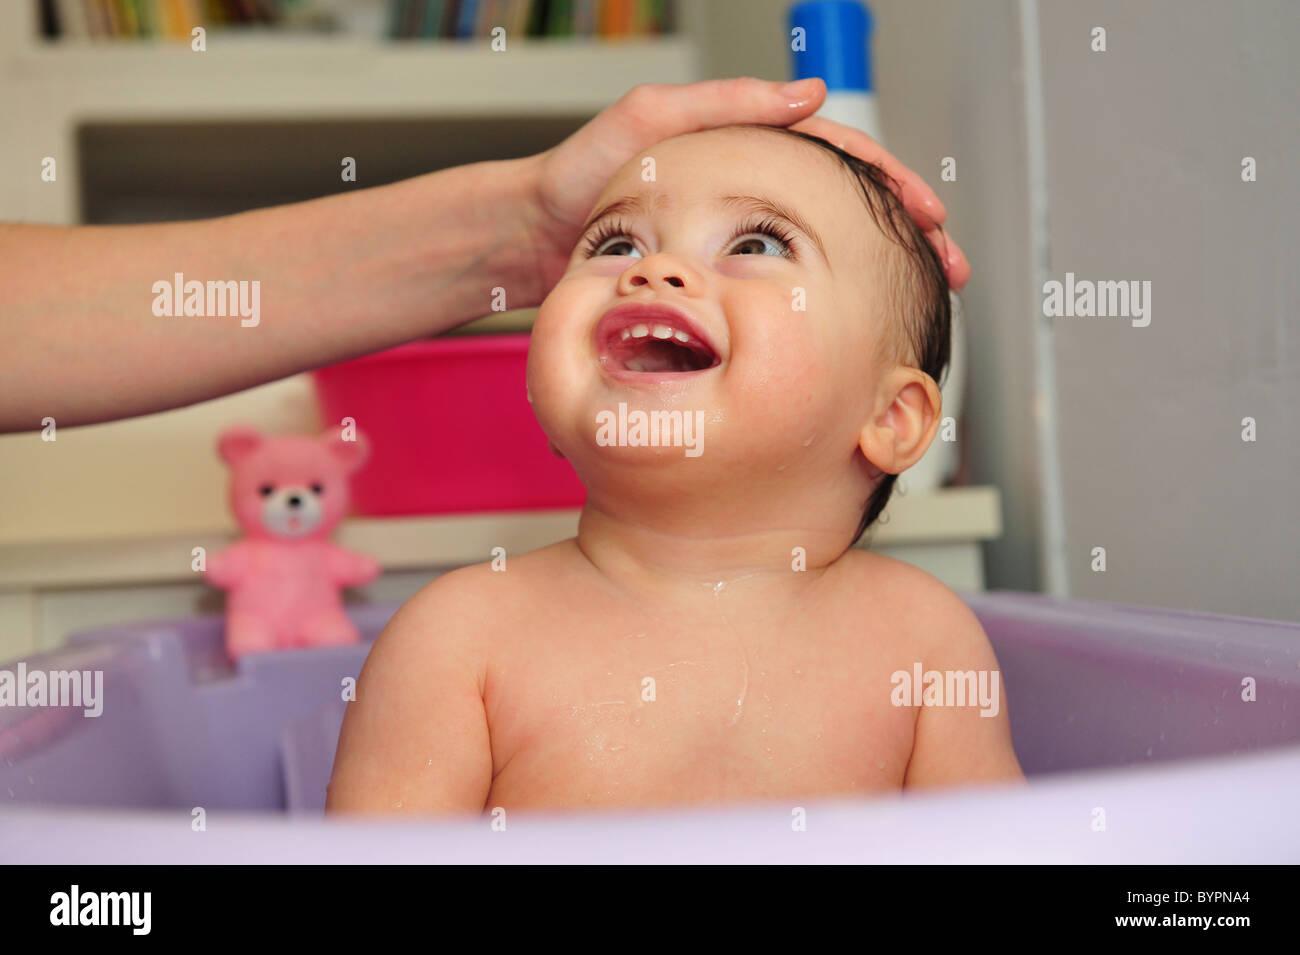 Cute baby bath in a purple bathtub by mother Stock Photo, Royalty ...